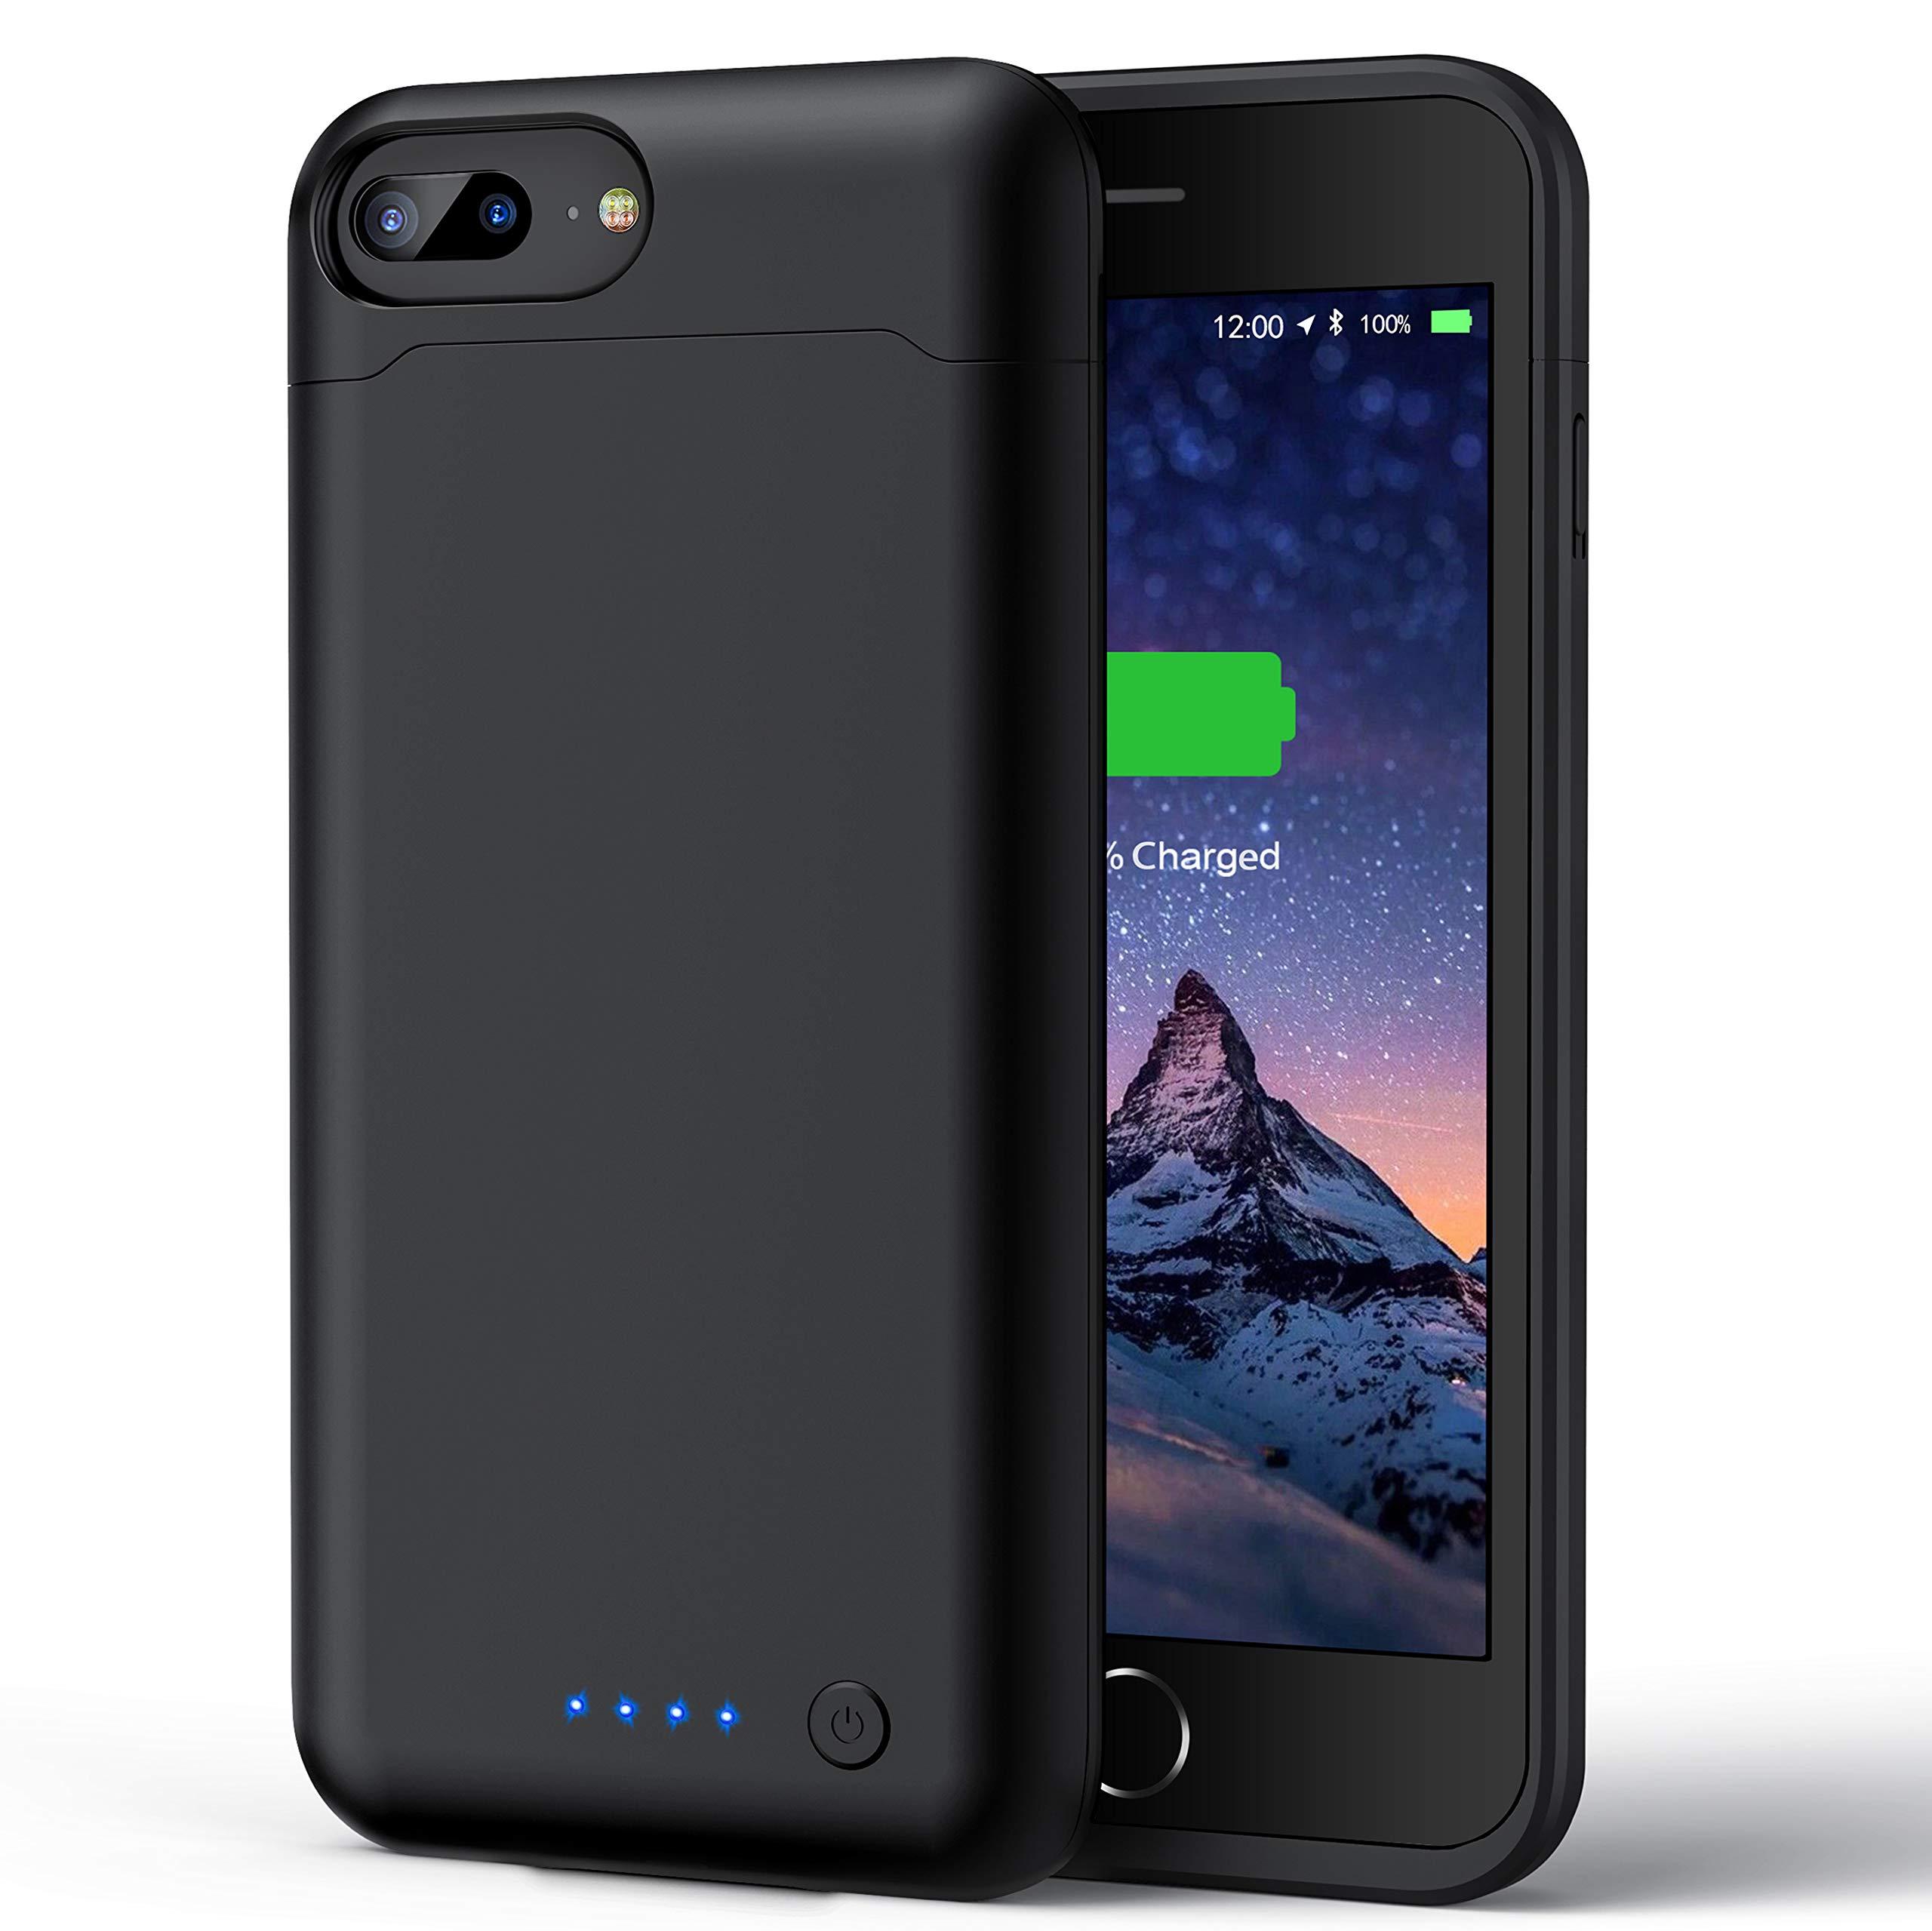 Battery Case for iPhone 8 Plus/ 7 Plus/ 6 Plus/ 6s Plus, 8500mAh Portable Charging Case Extended Battery Pack Rechargeable Charger Case for iPhone 8 Plus/ 7 Plus/ 6 Plus/ 6s Plus (5.5inch) -Black